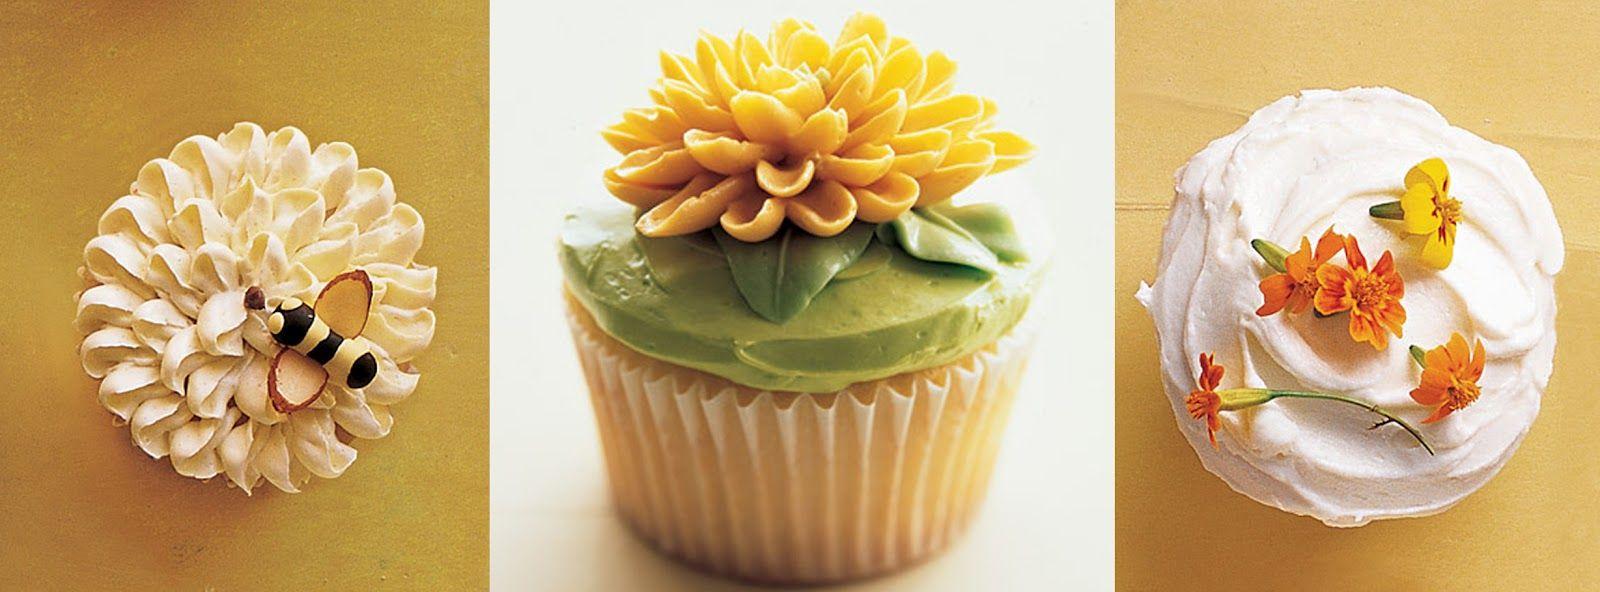 martha stewart tea tags   We love these adorable flower themed cupcakes from Martha Stewart .